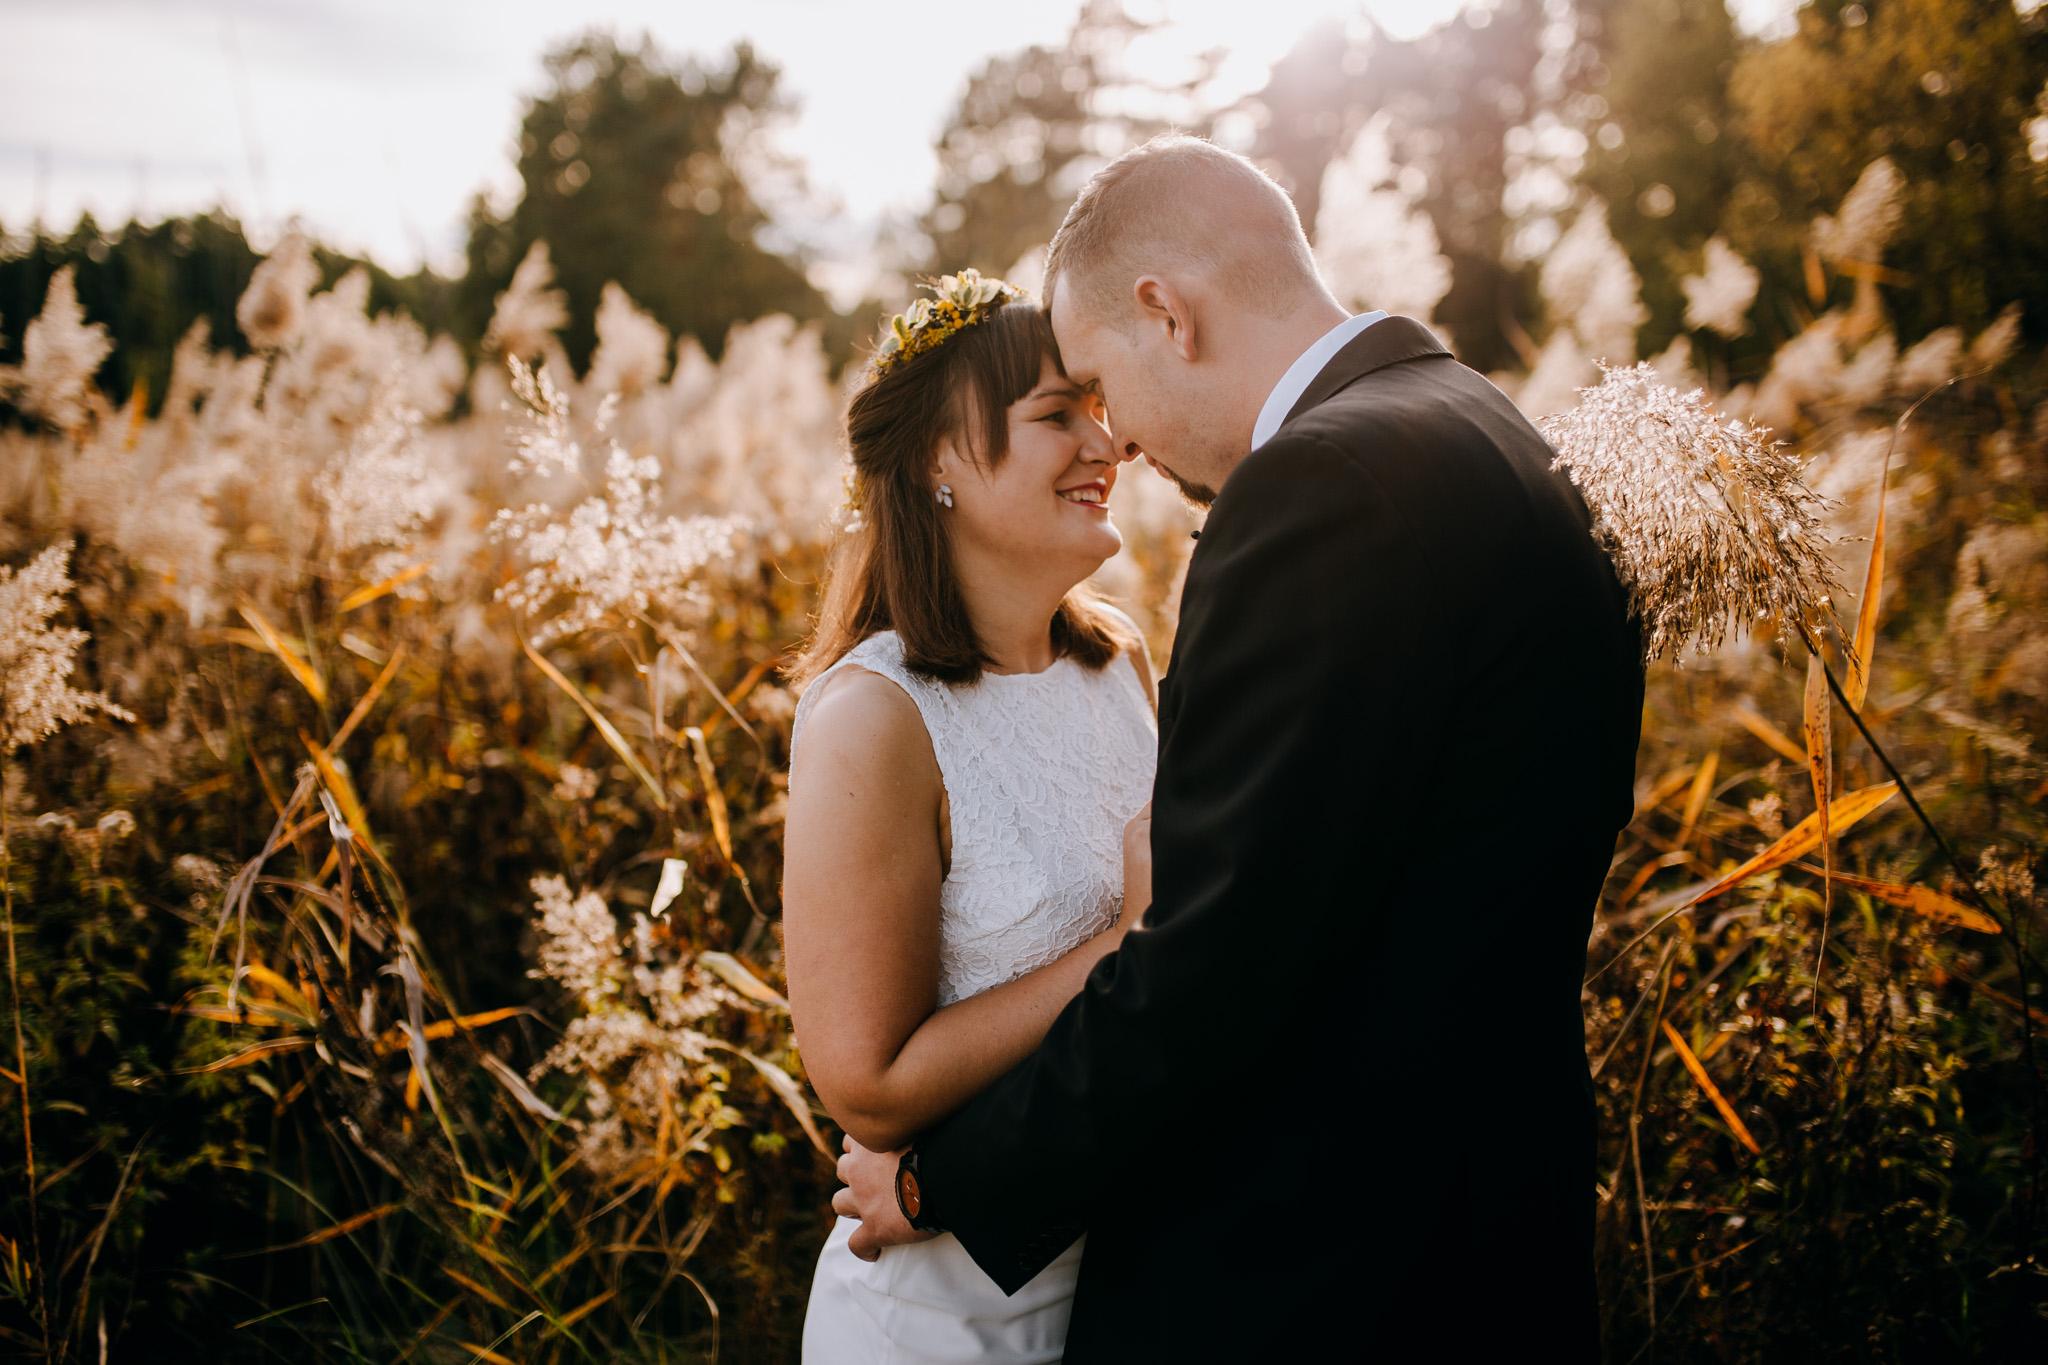 Natalia & Kuba – słoneczna sesja ślubna